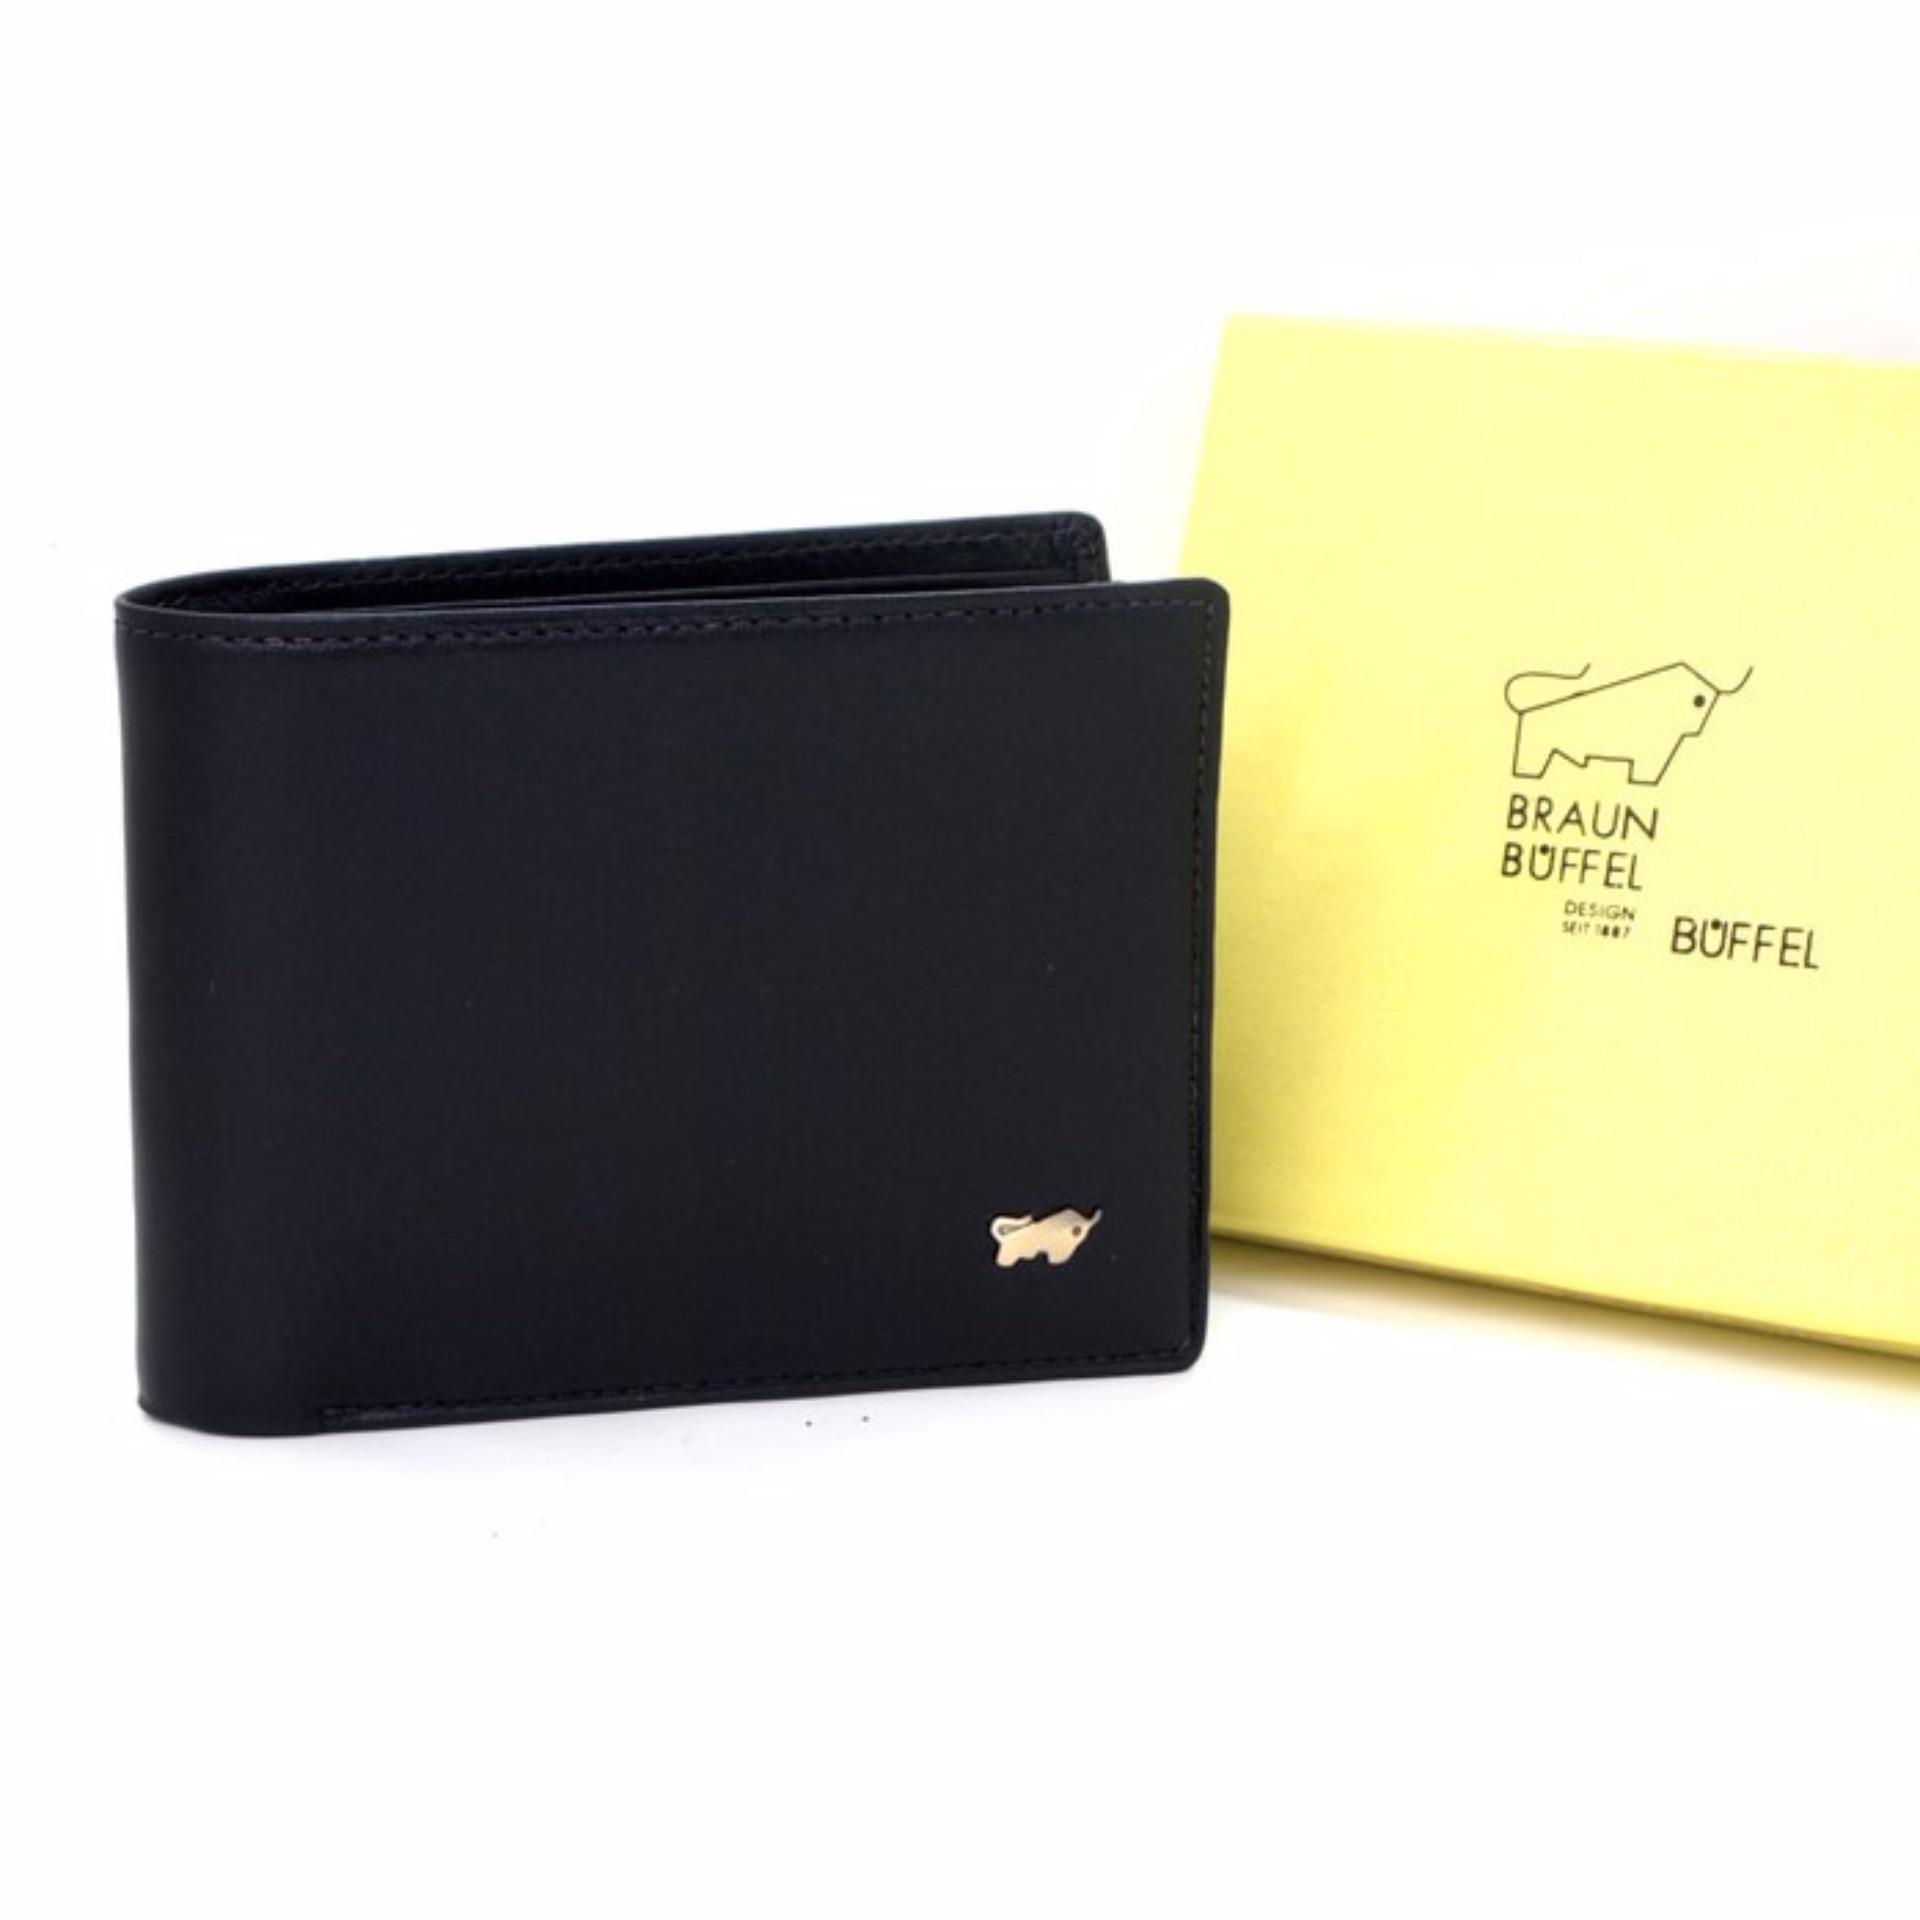 Promo Braun Buffel Black Dompet Kulit Pria Tidur Murah